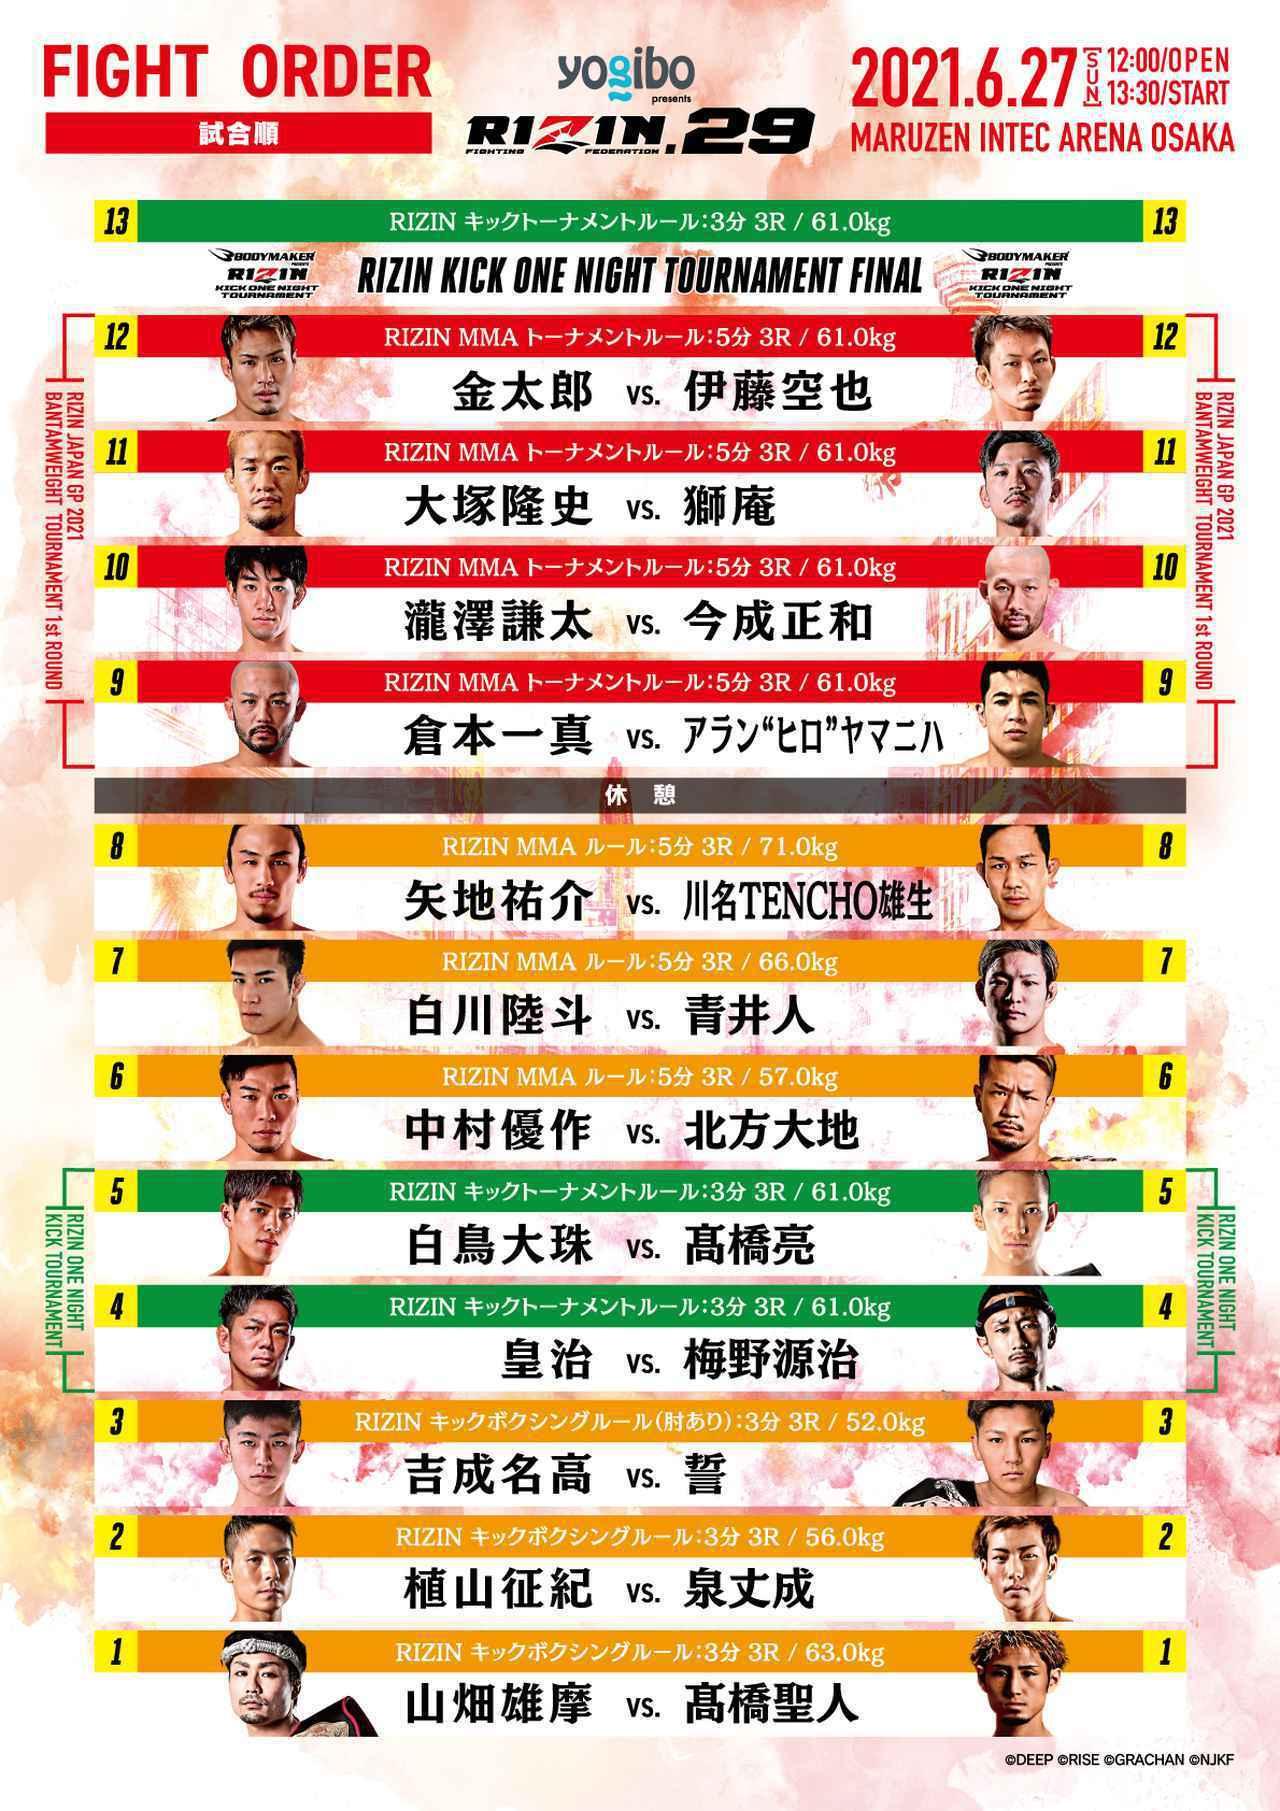 『Yogibo presents RIZIN.29』大阪大会の全試合順